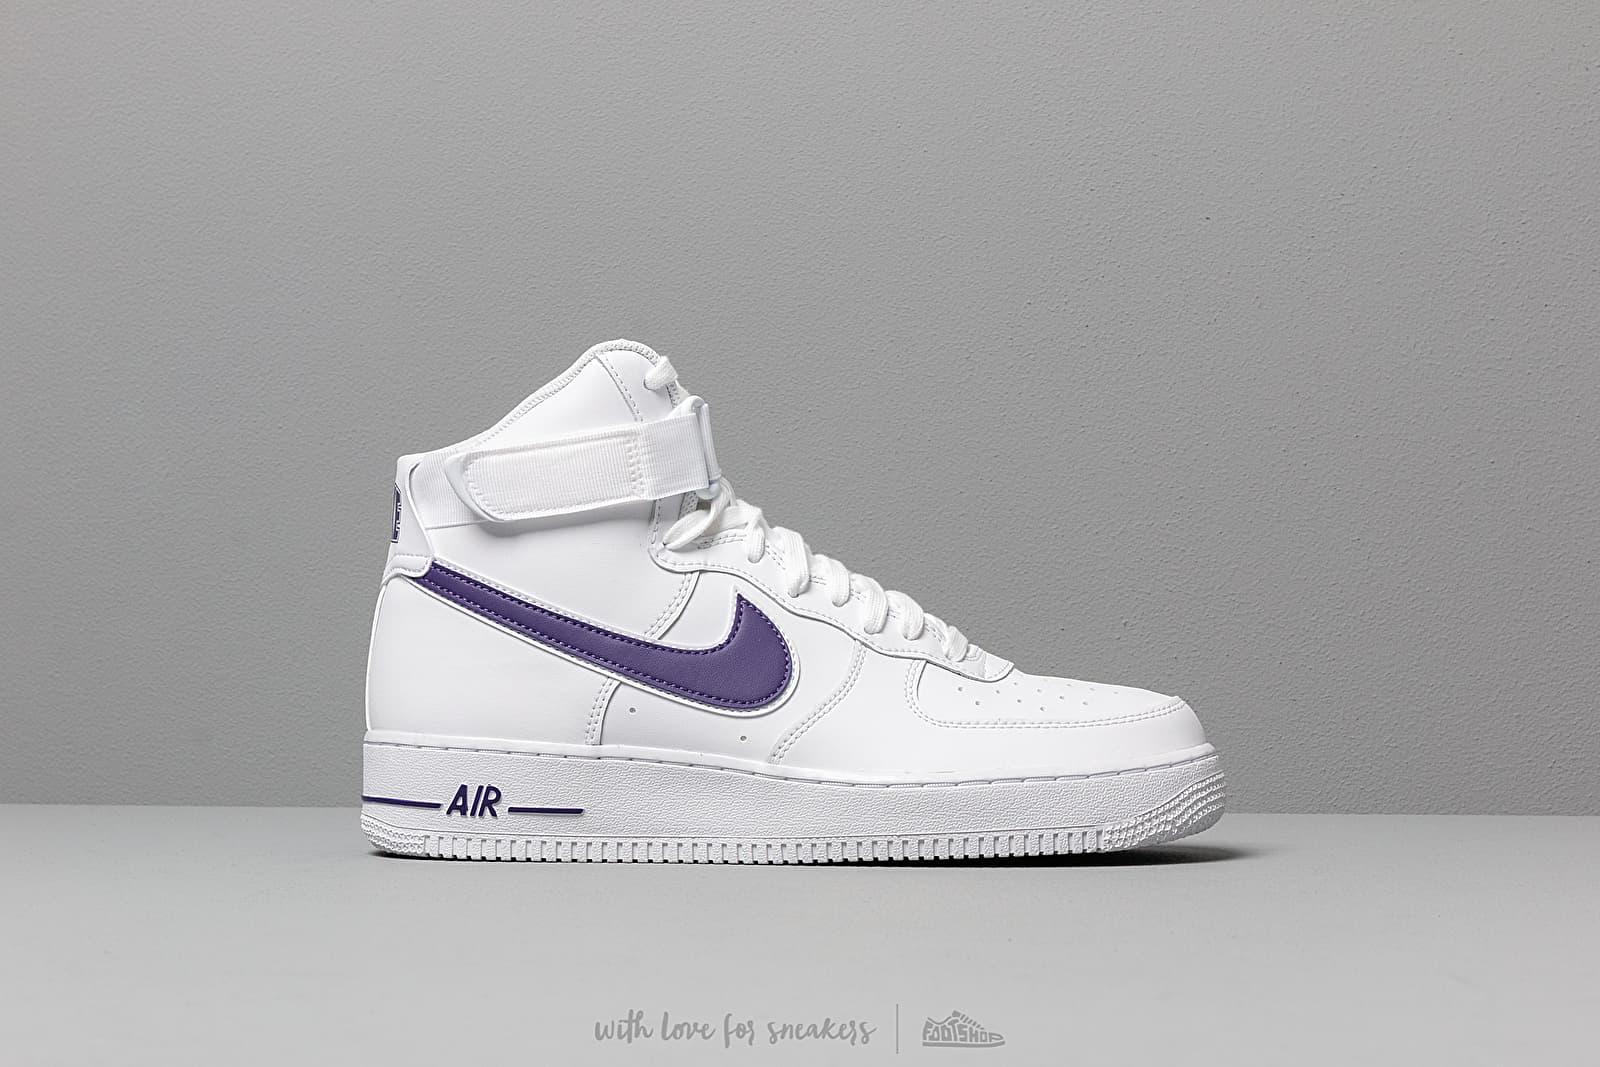 Nike Air Force 1 High '07 3 White White Court Purple | Footshop